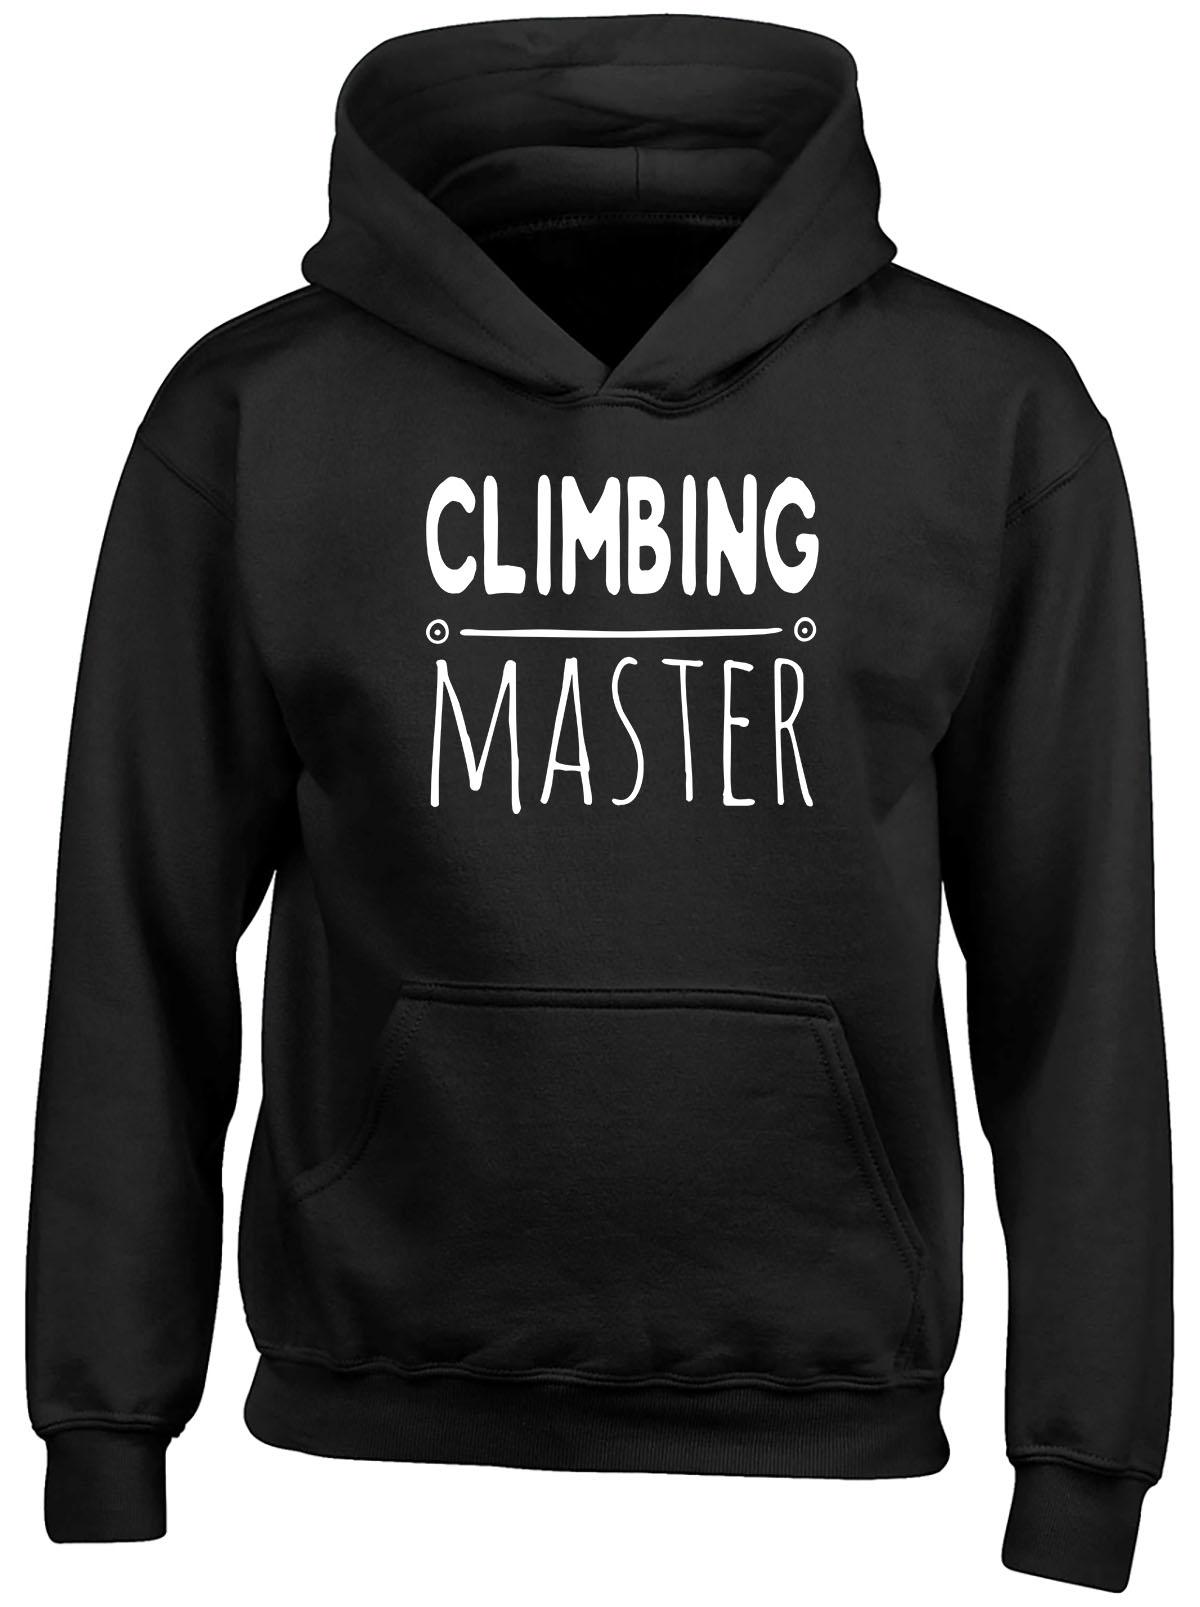 Climbing Master Childrens Kids Hooded Top Hoodie Boys Girls